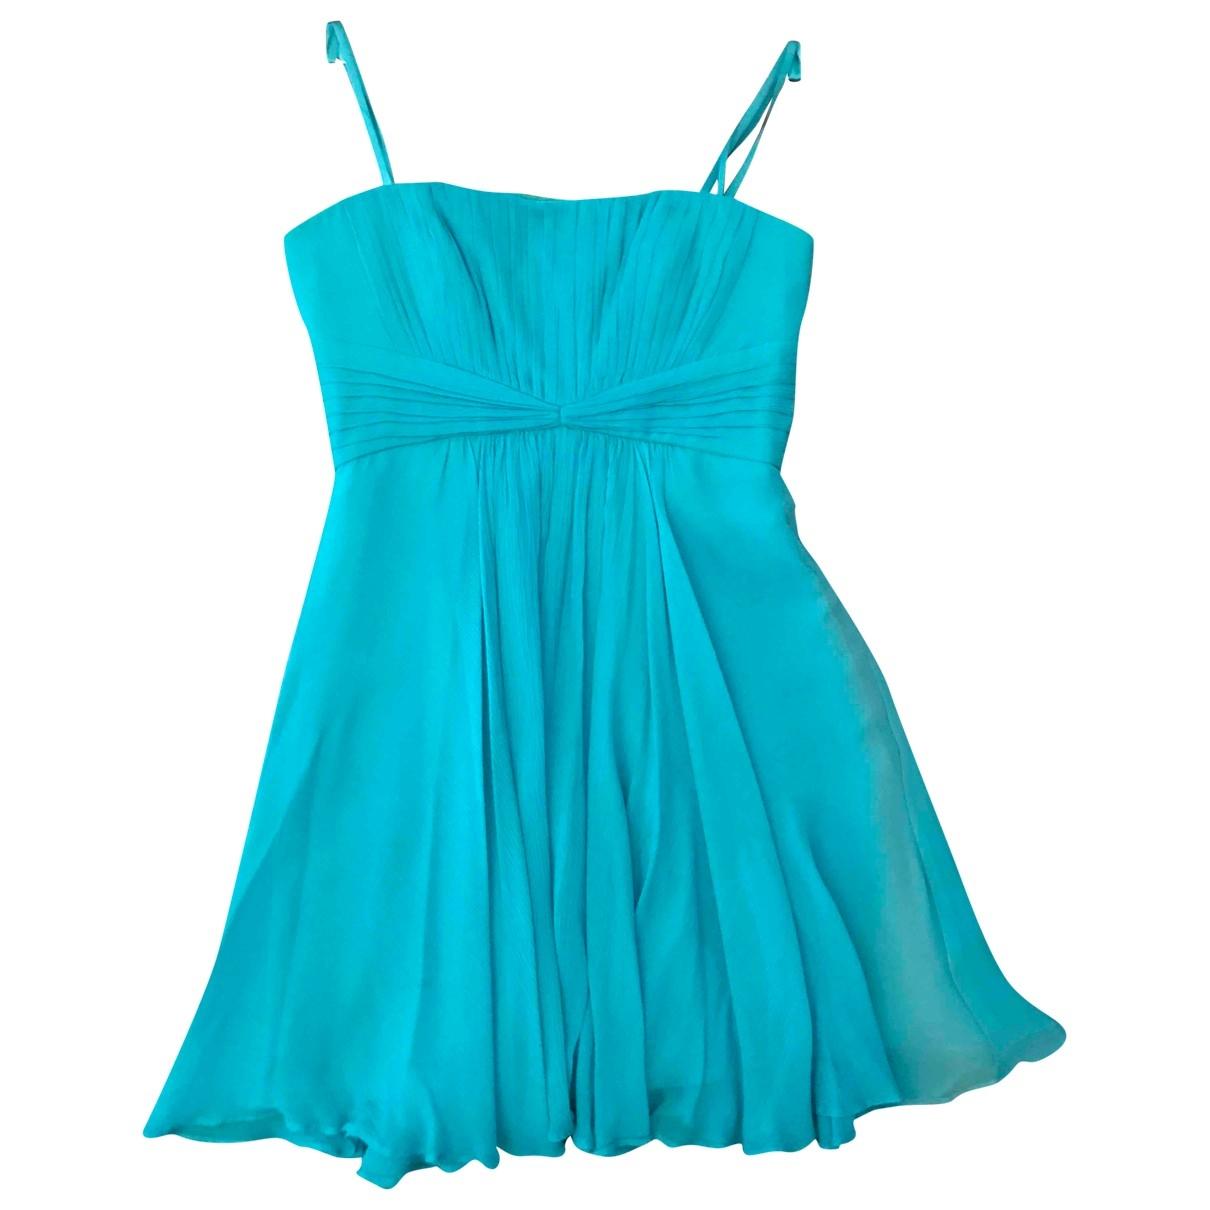 Bcbg Max Azria \N Turquoise Silk dress for Women 4 US